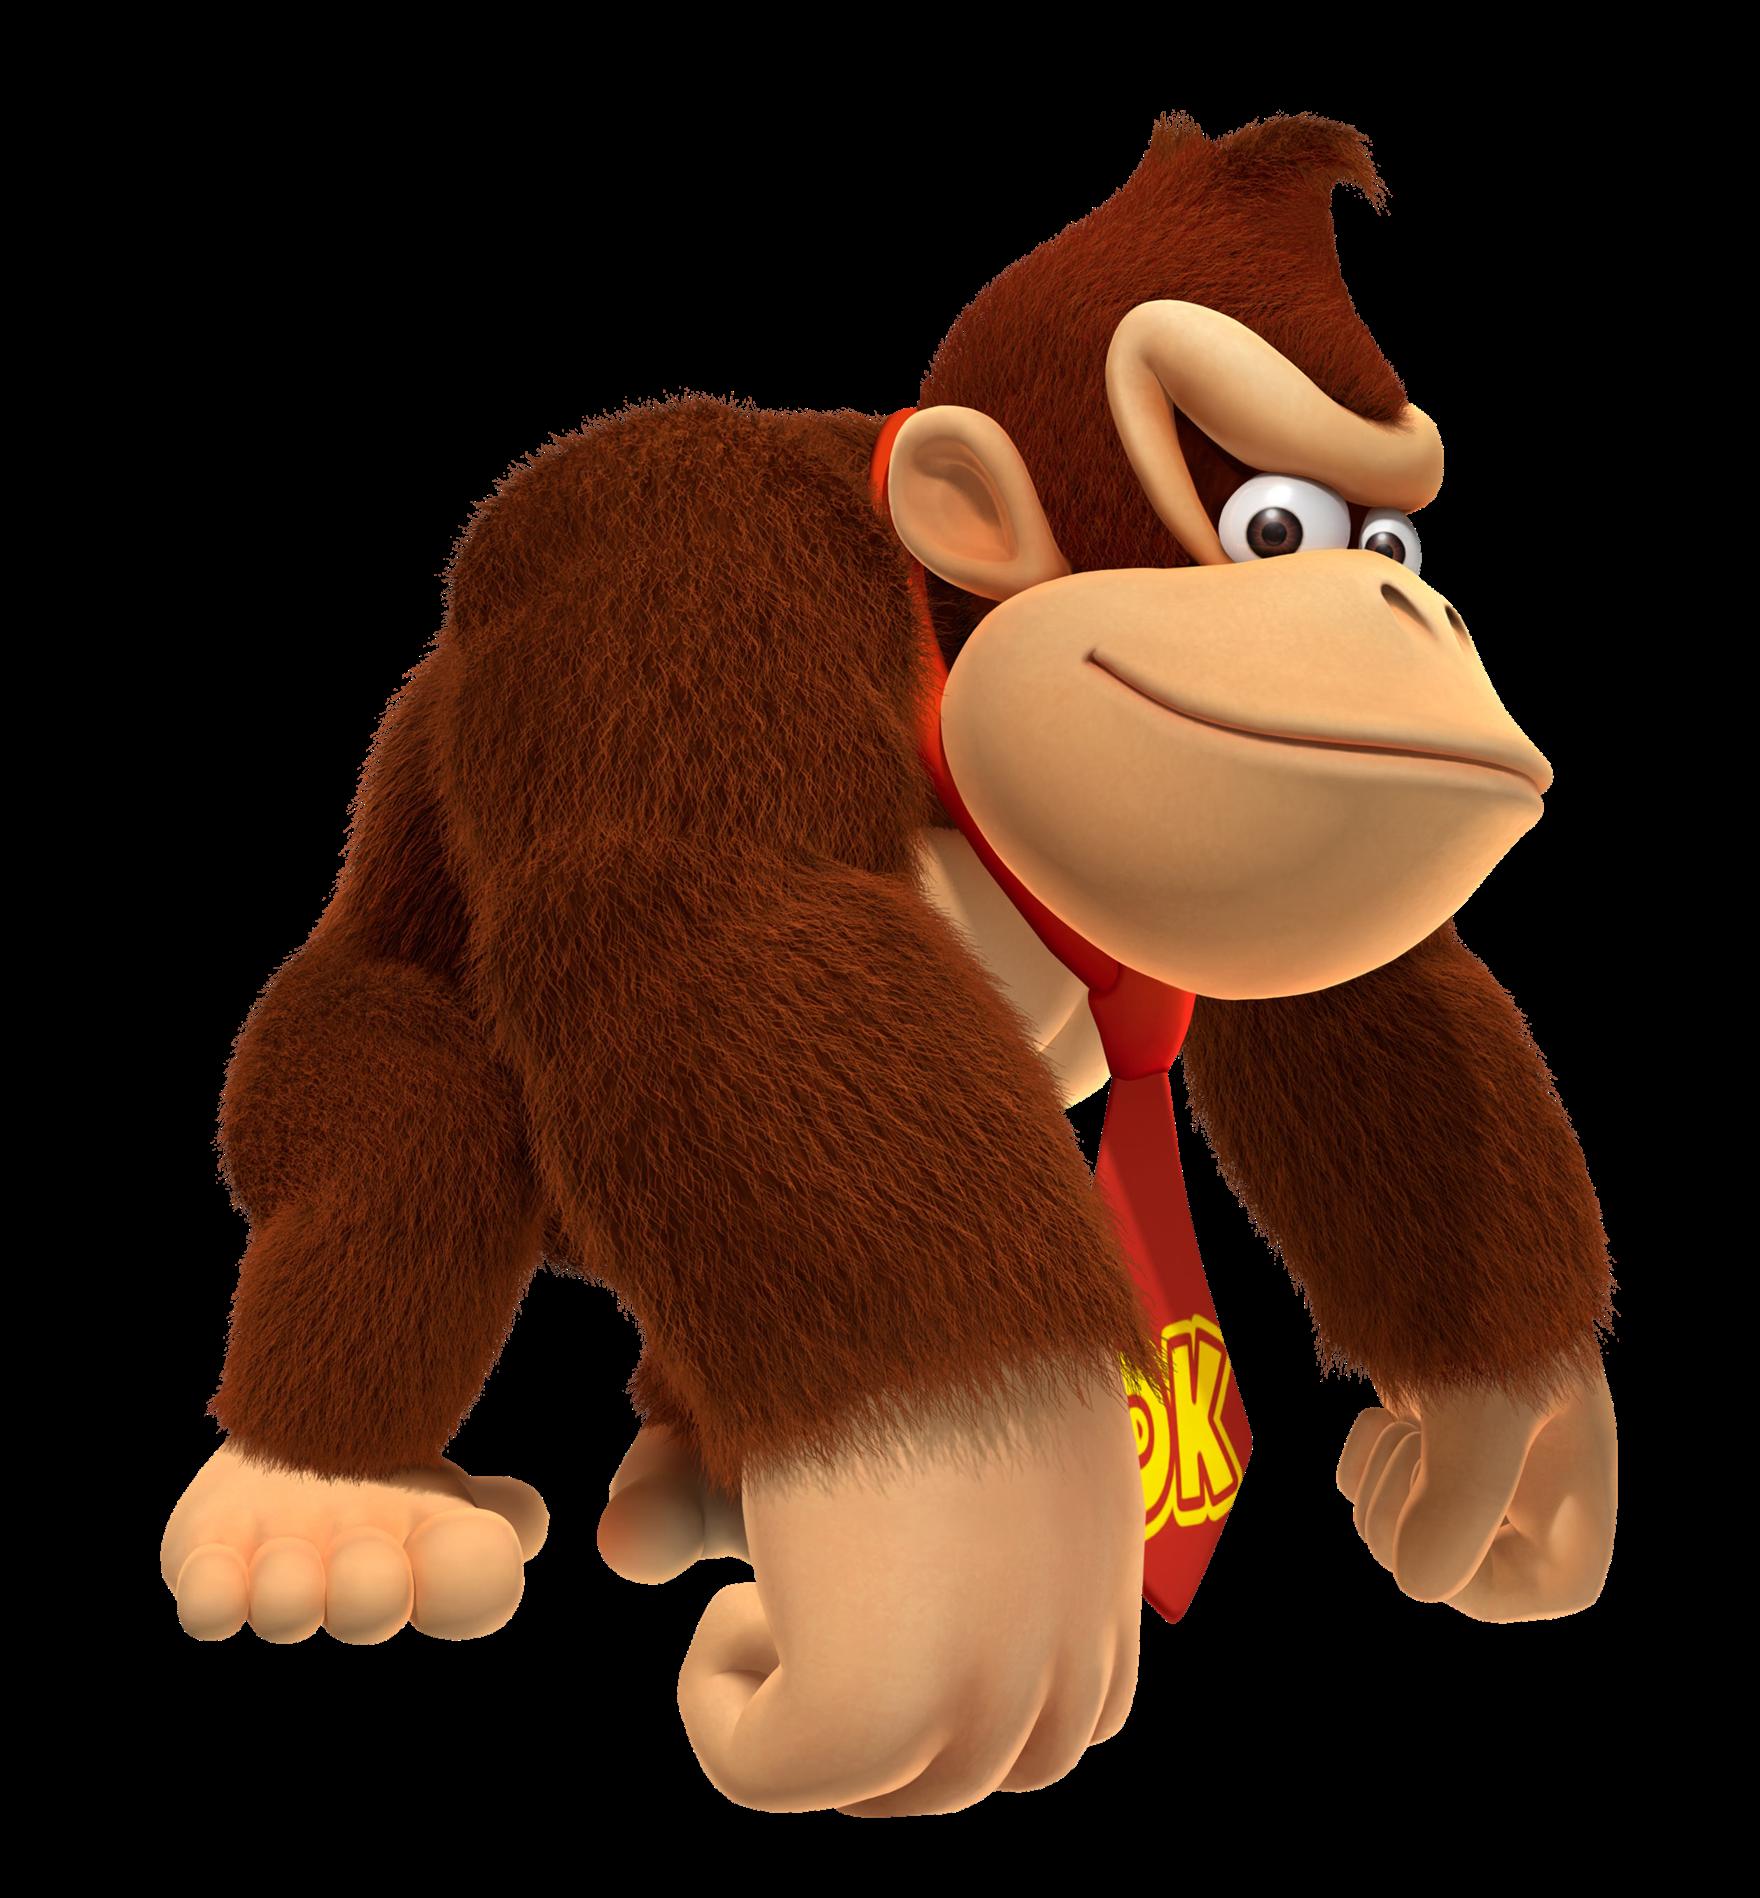 Donkey Kong PNG Photo.